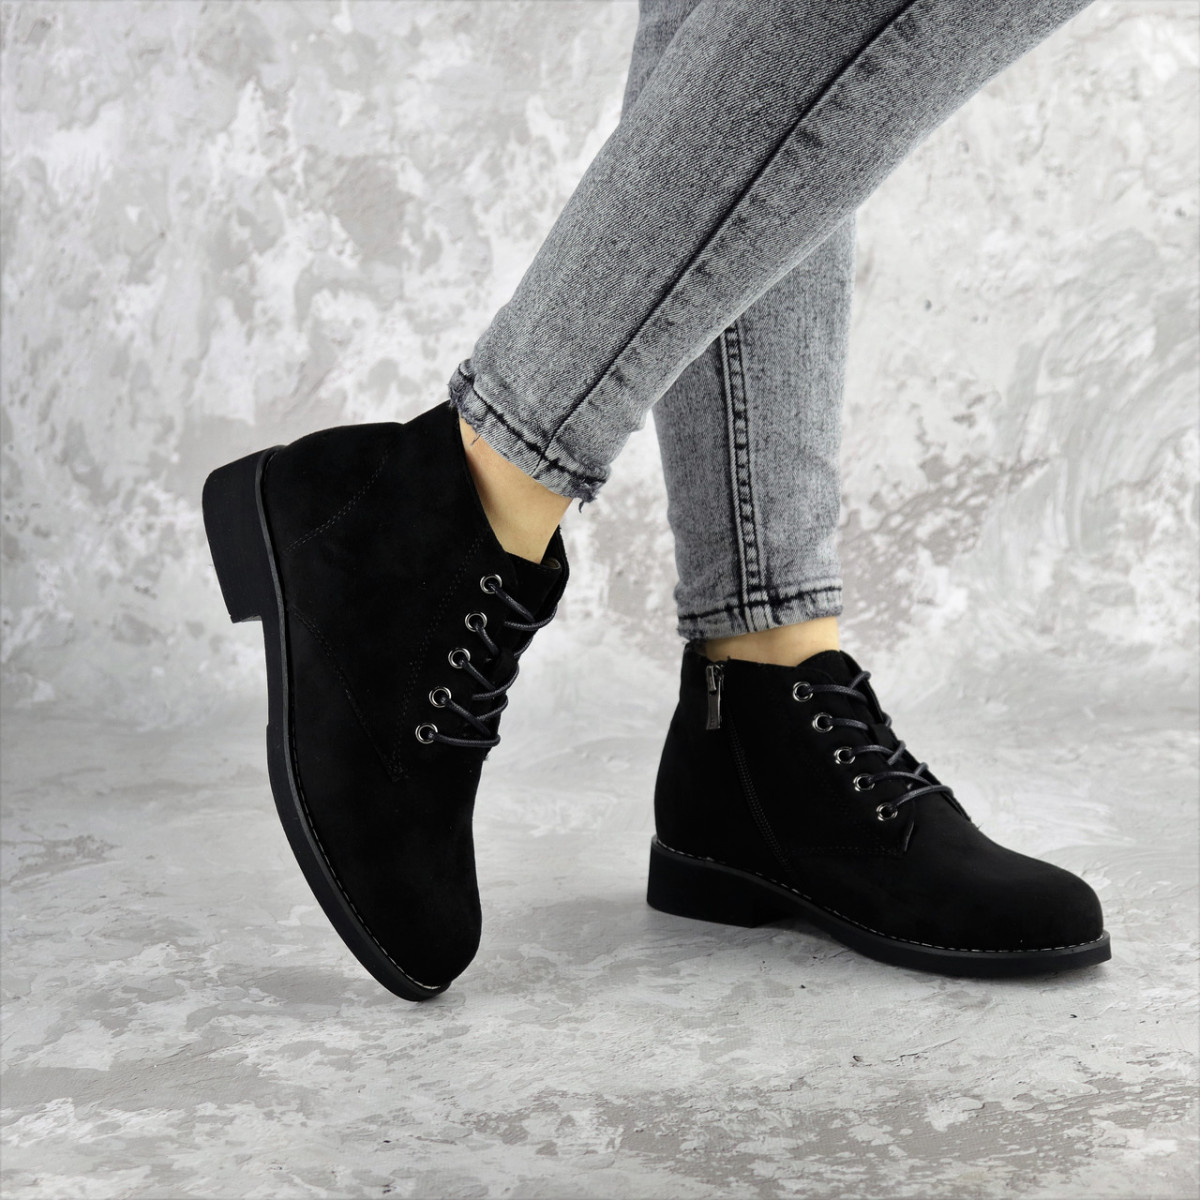 Ботинки женские Fashion Plushbottom 2382 36 размер 23,5 см Черный